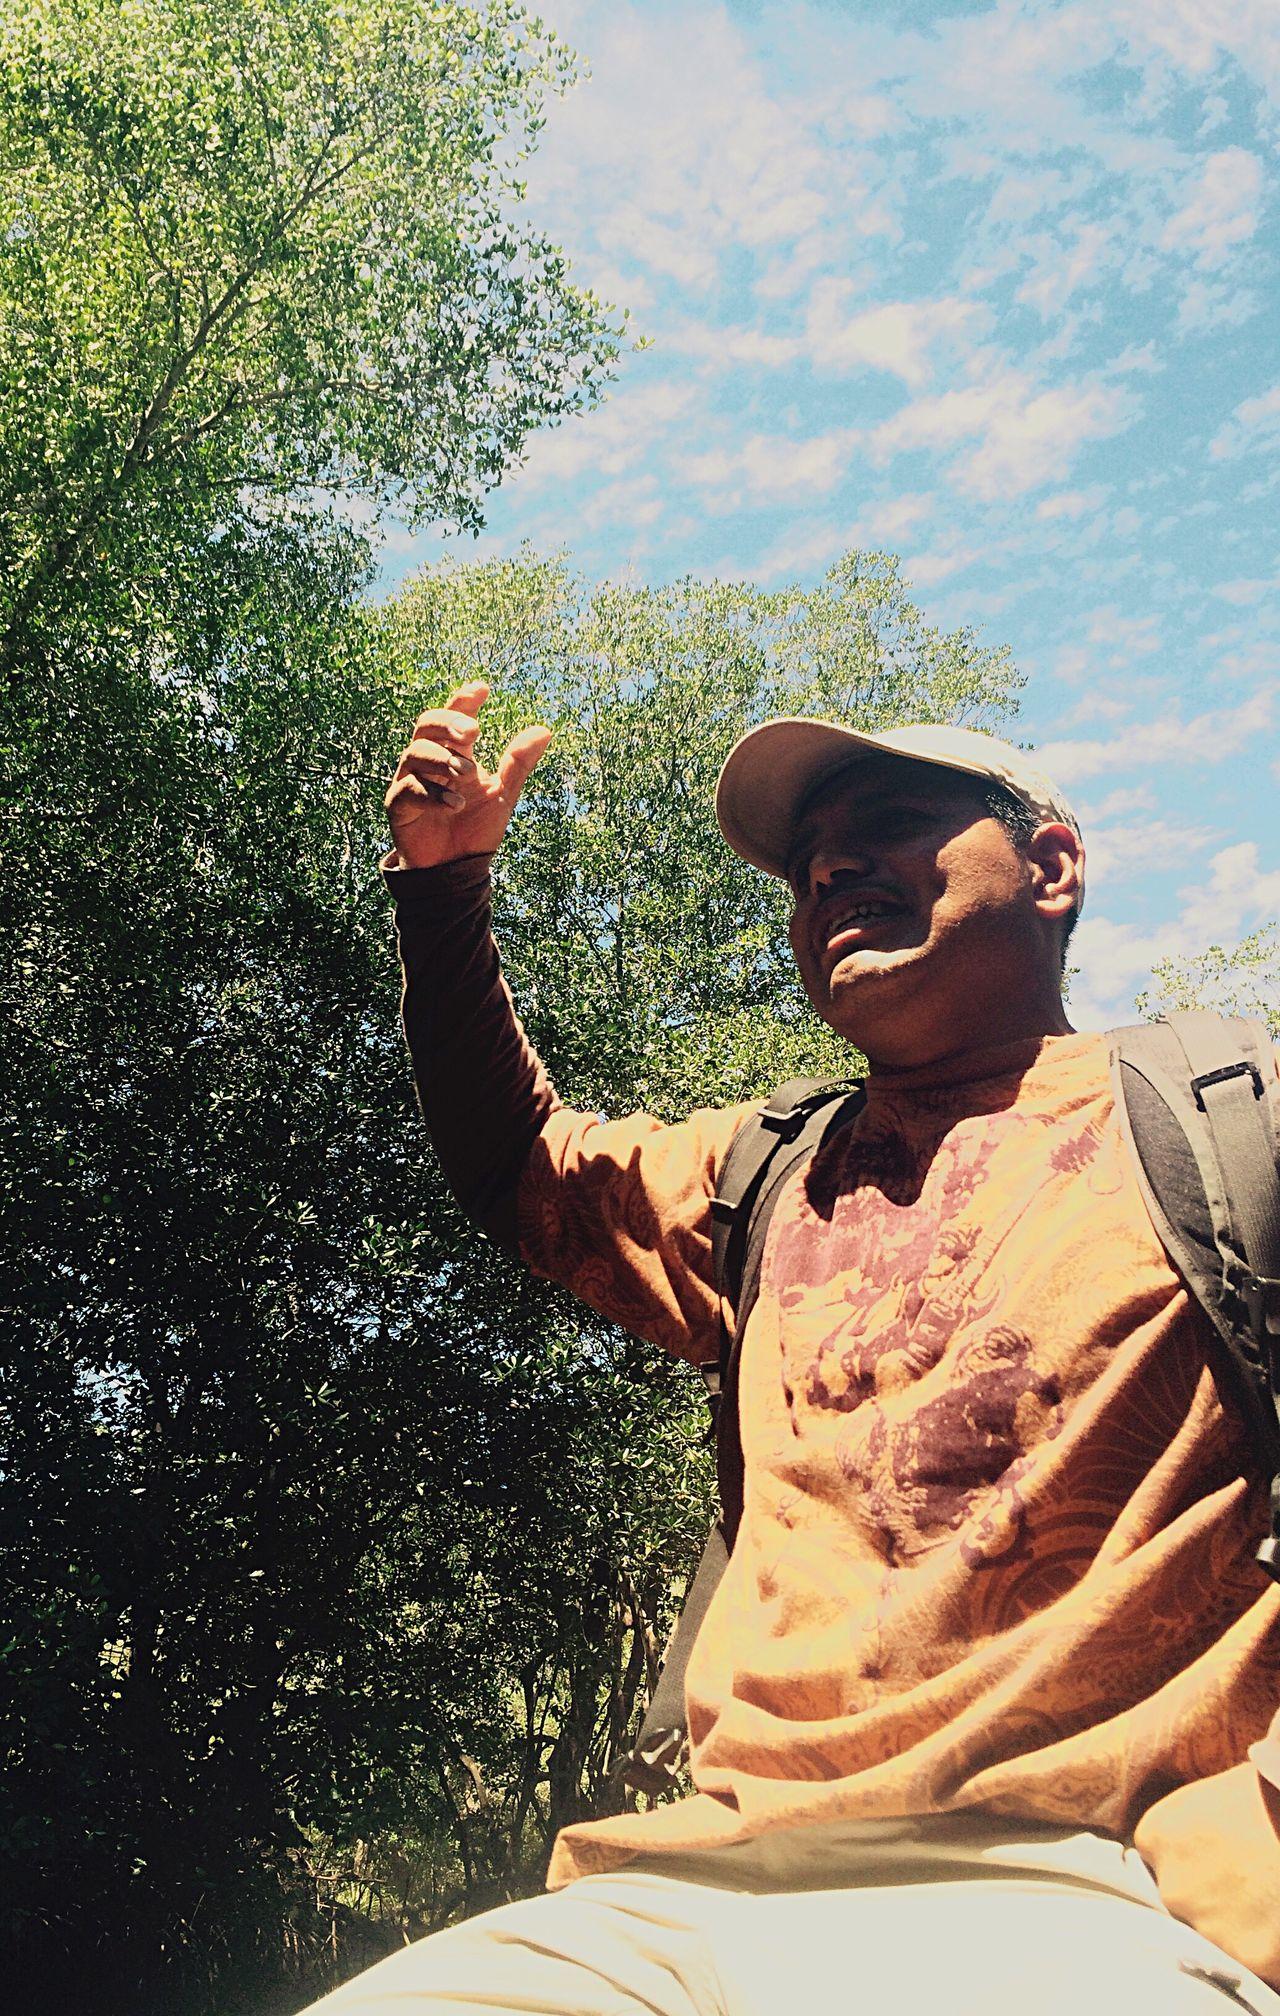 The Following Tour Guide Mangrove Life Mangrove Tour El Salvador On The Way